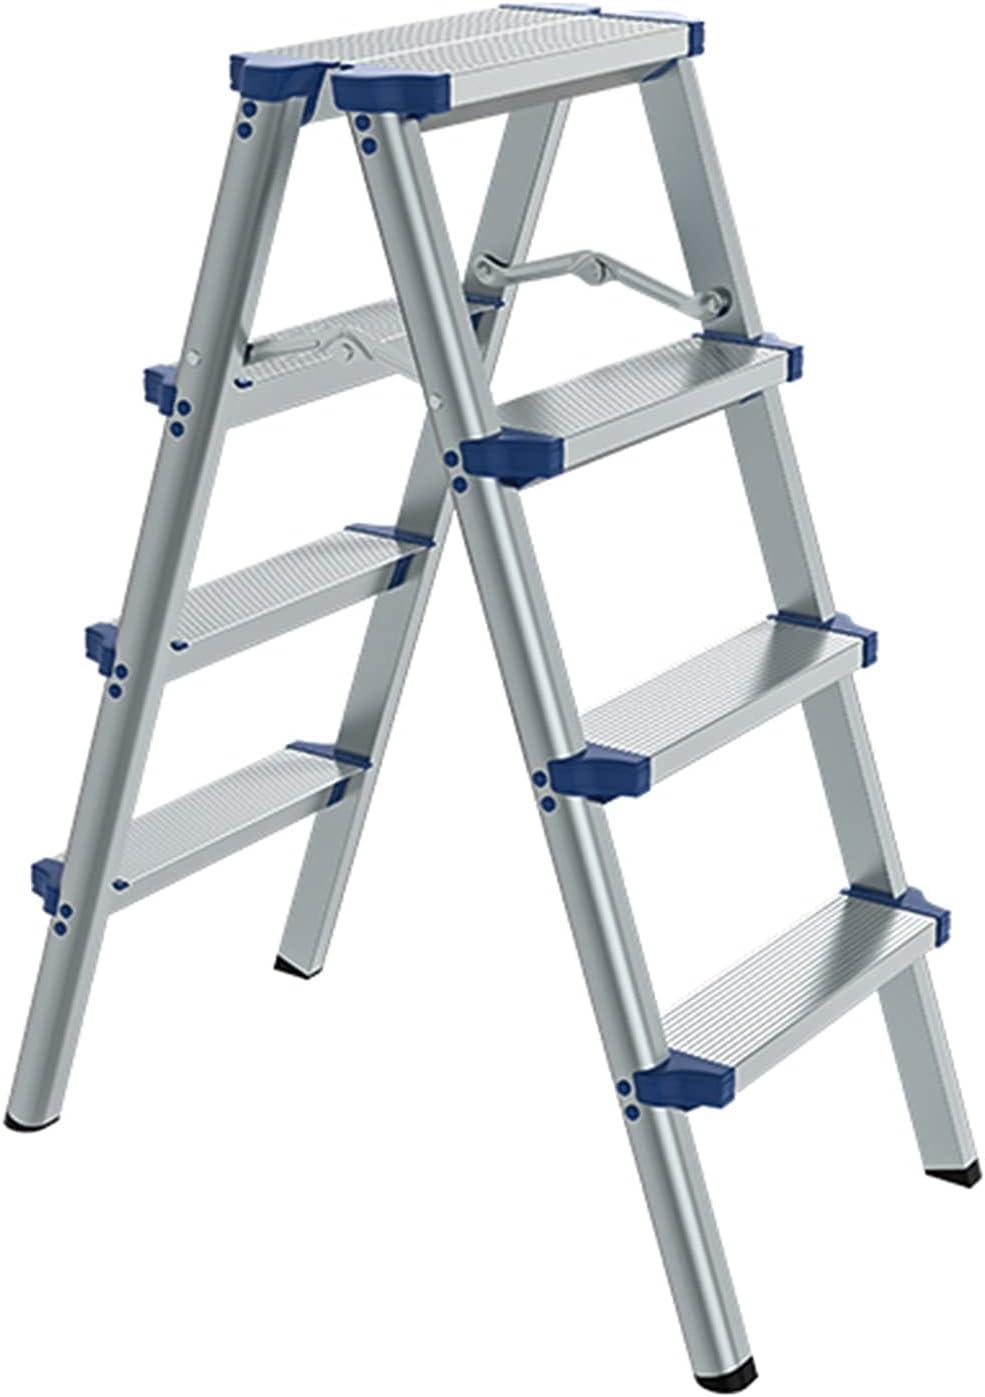 ZRN Translated Multi-Purpose Ladder Stool Folding Aluminum Stepladder Alloy It is very popular